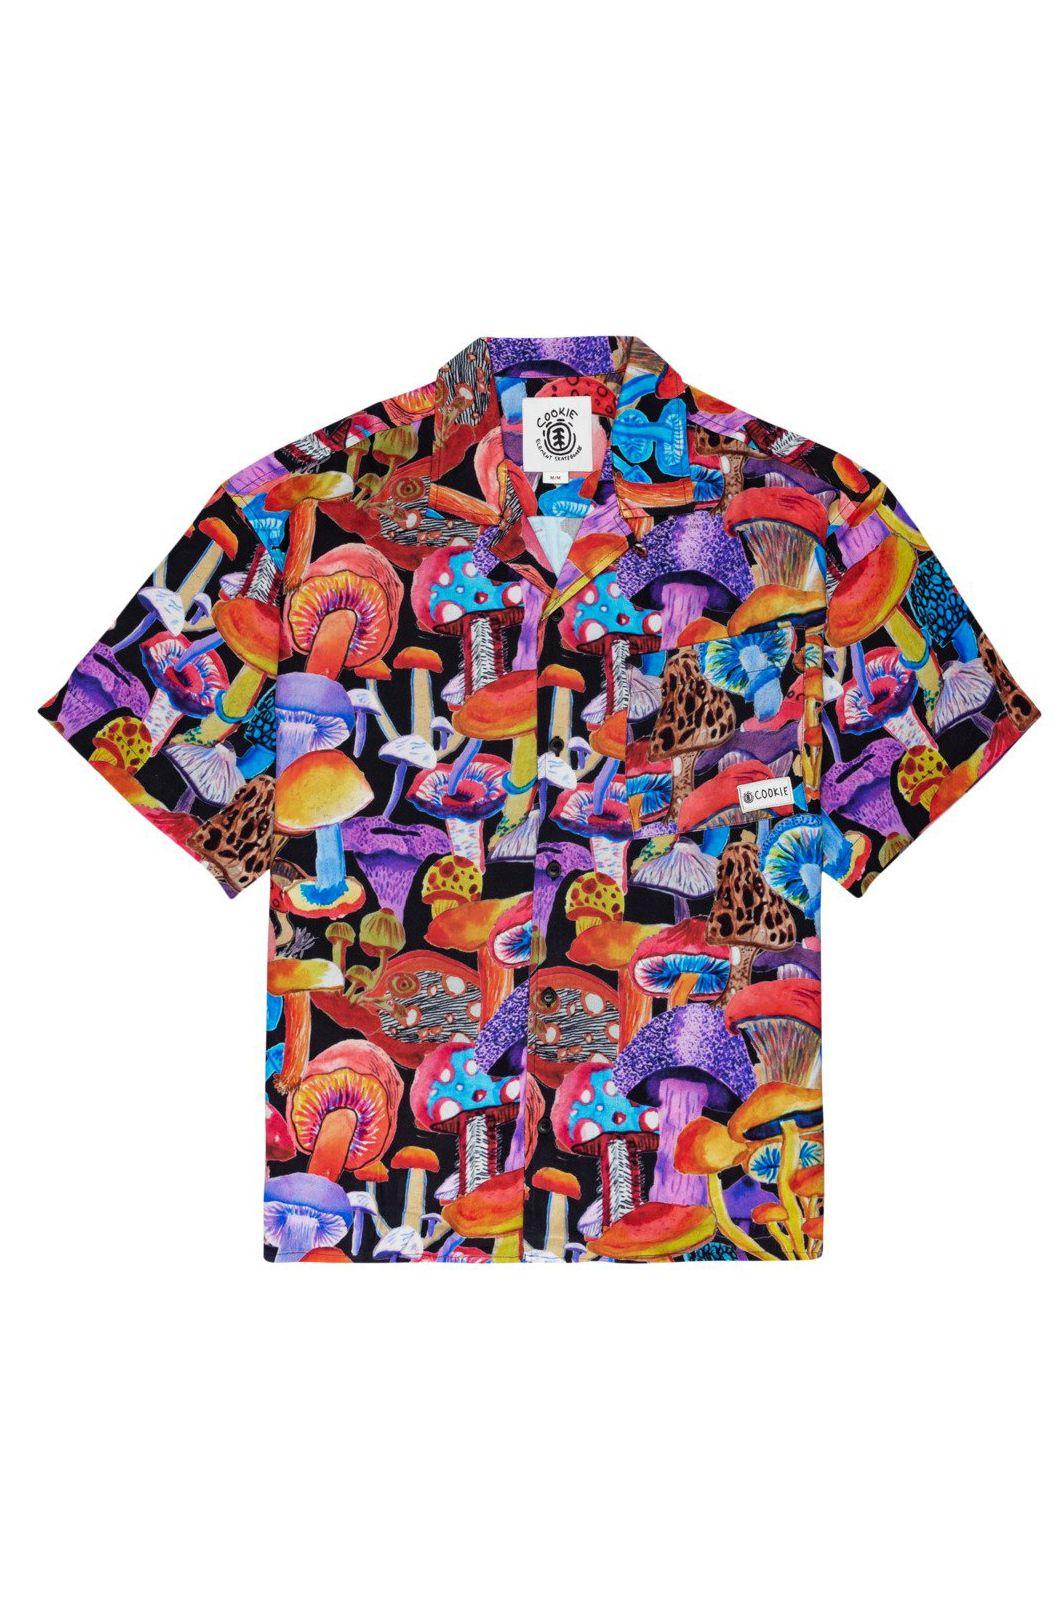 Element Shirt SHROOMS SS SHROOMS PACK Big Shrooms